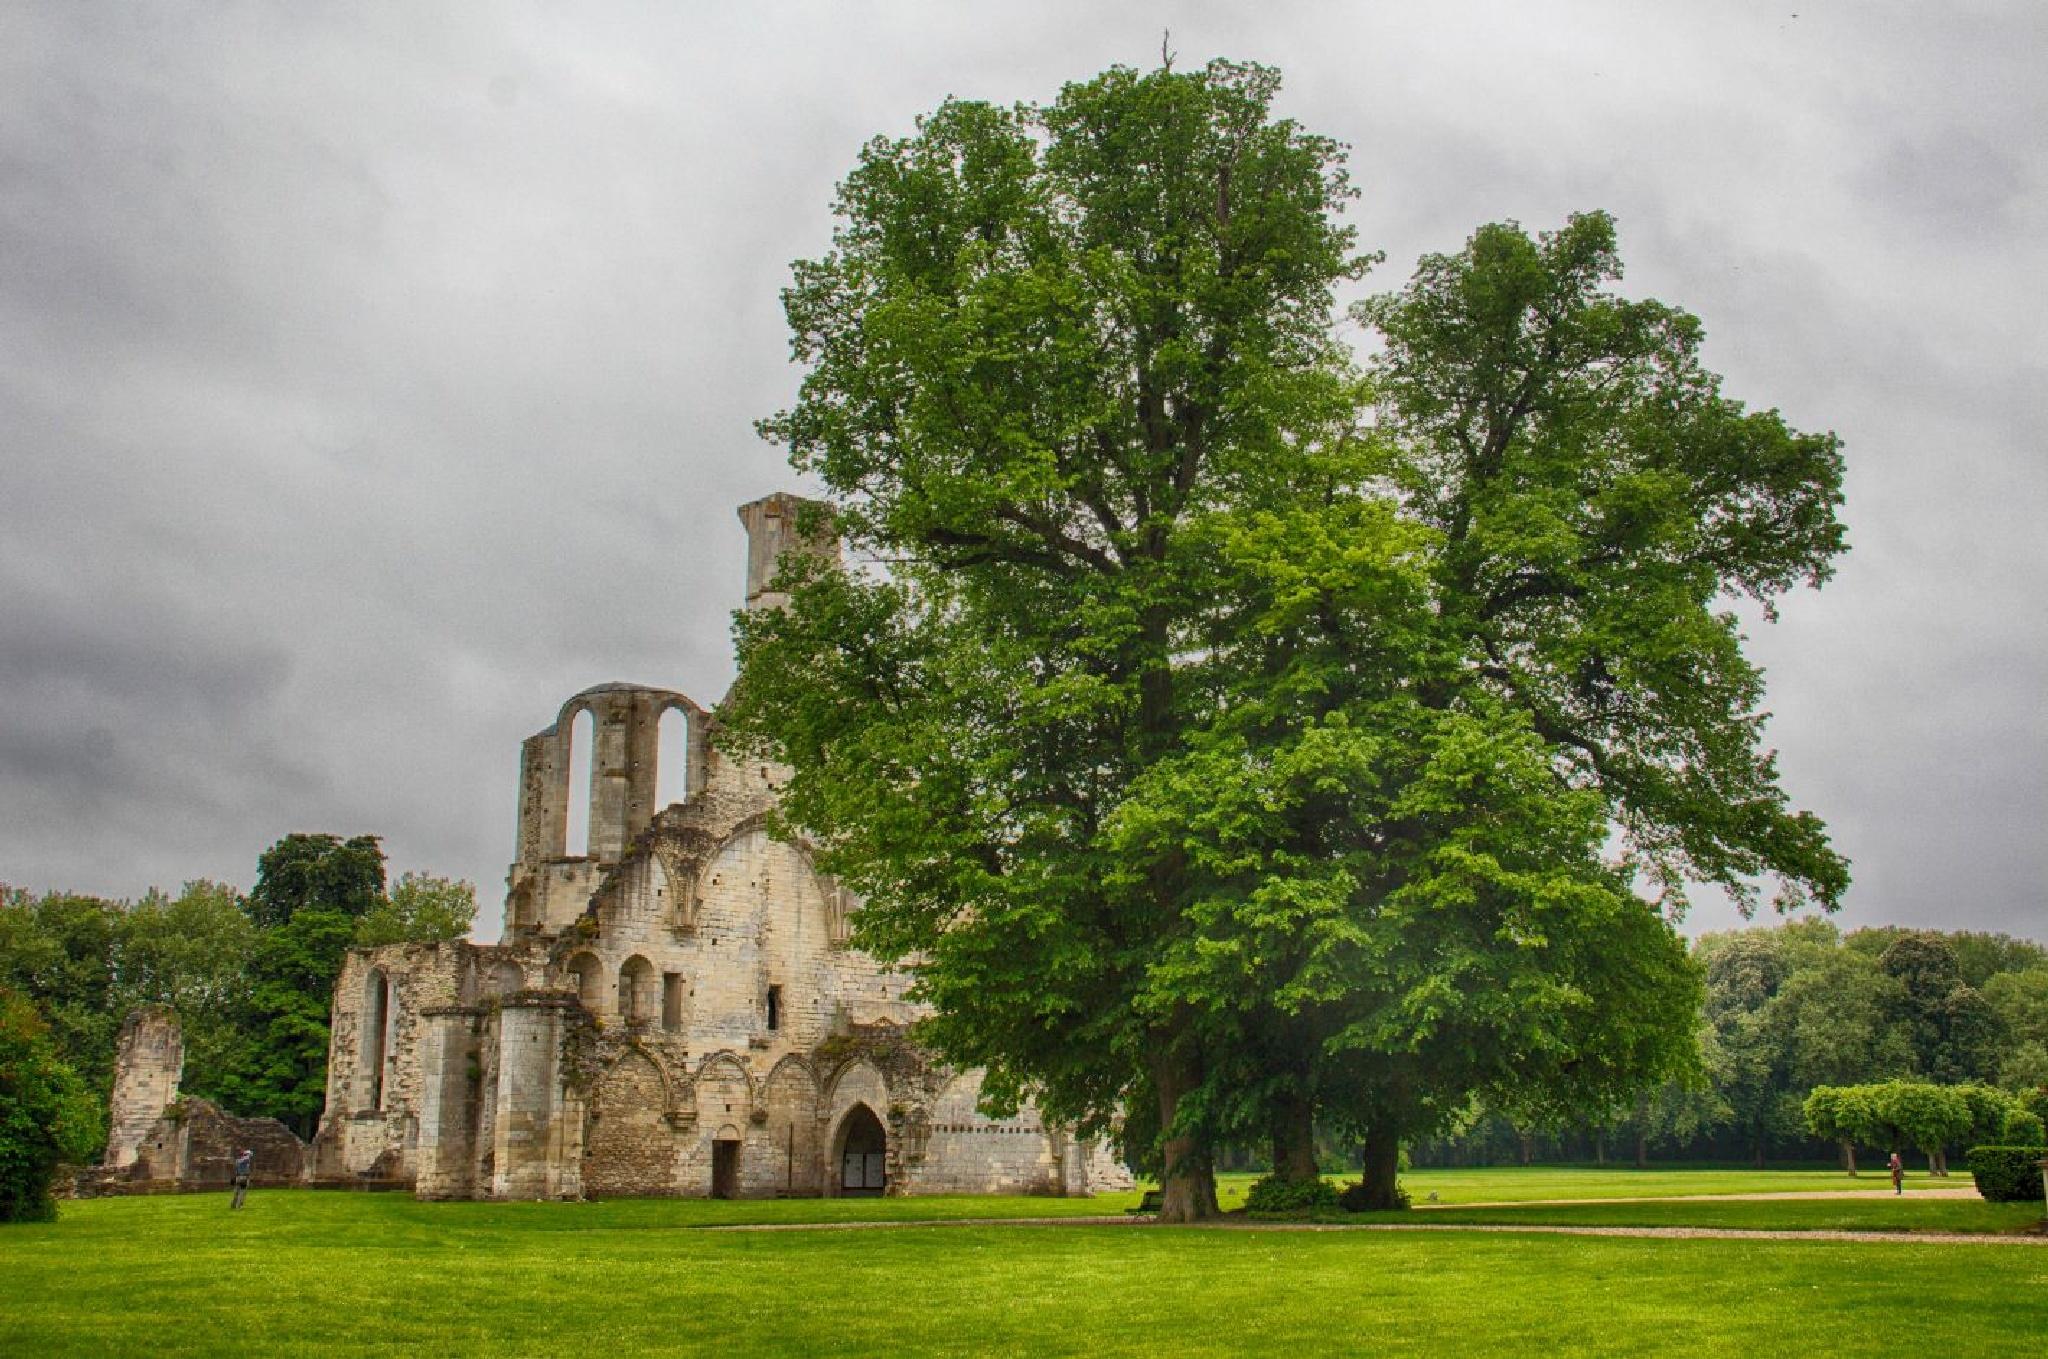 Abbaye de Chaalis by abeille77